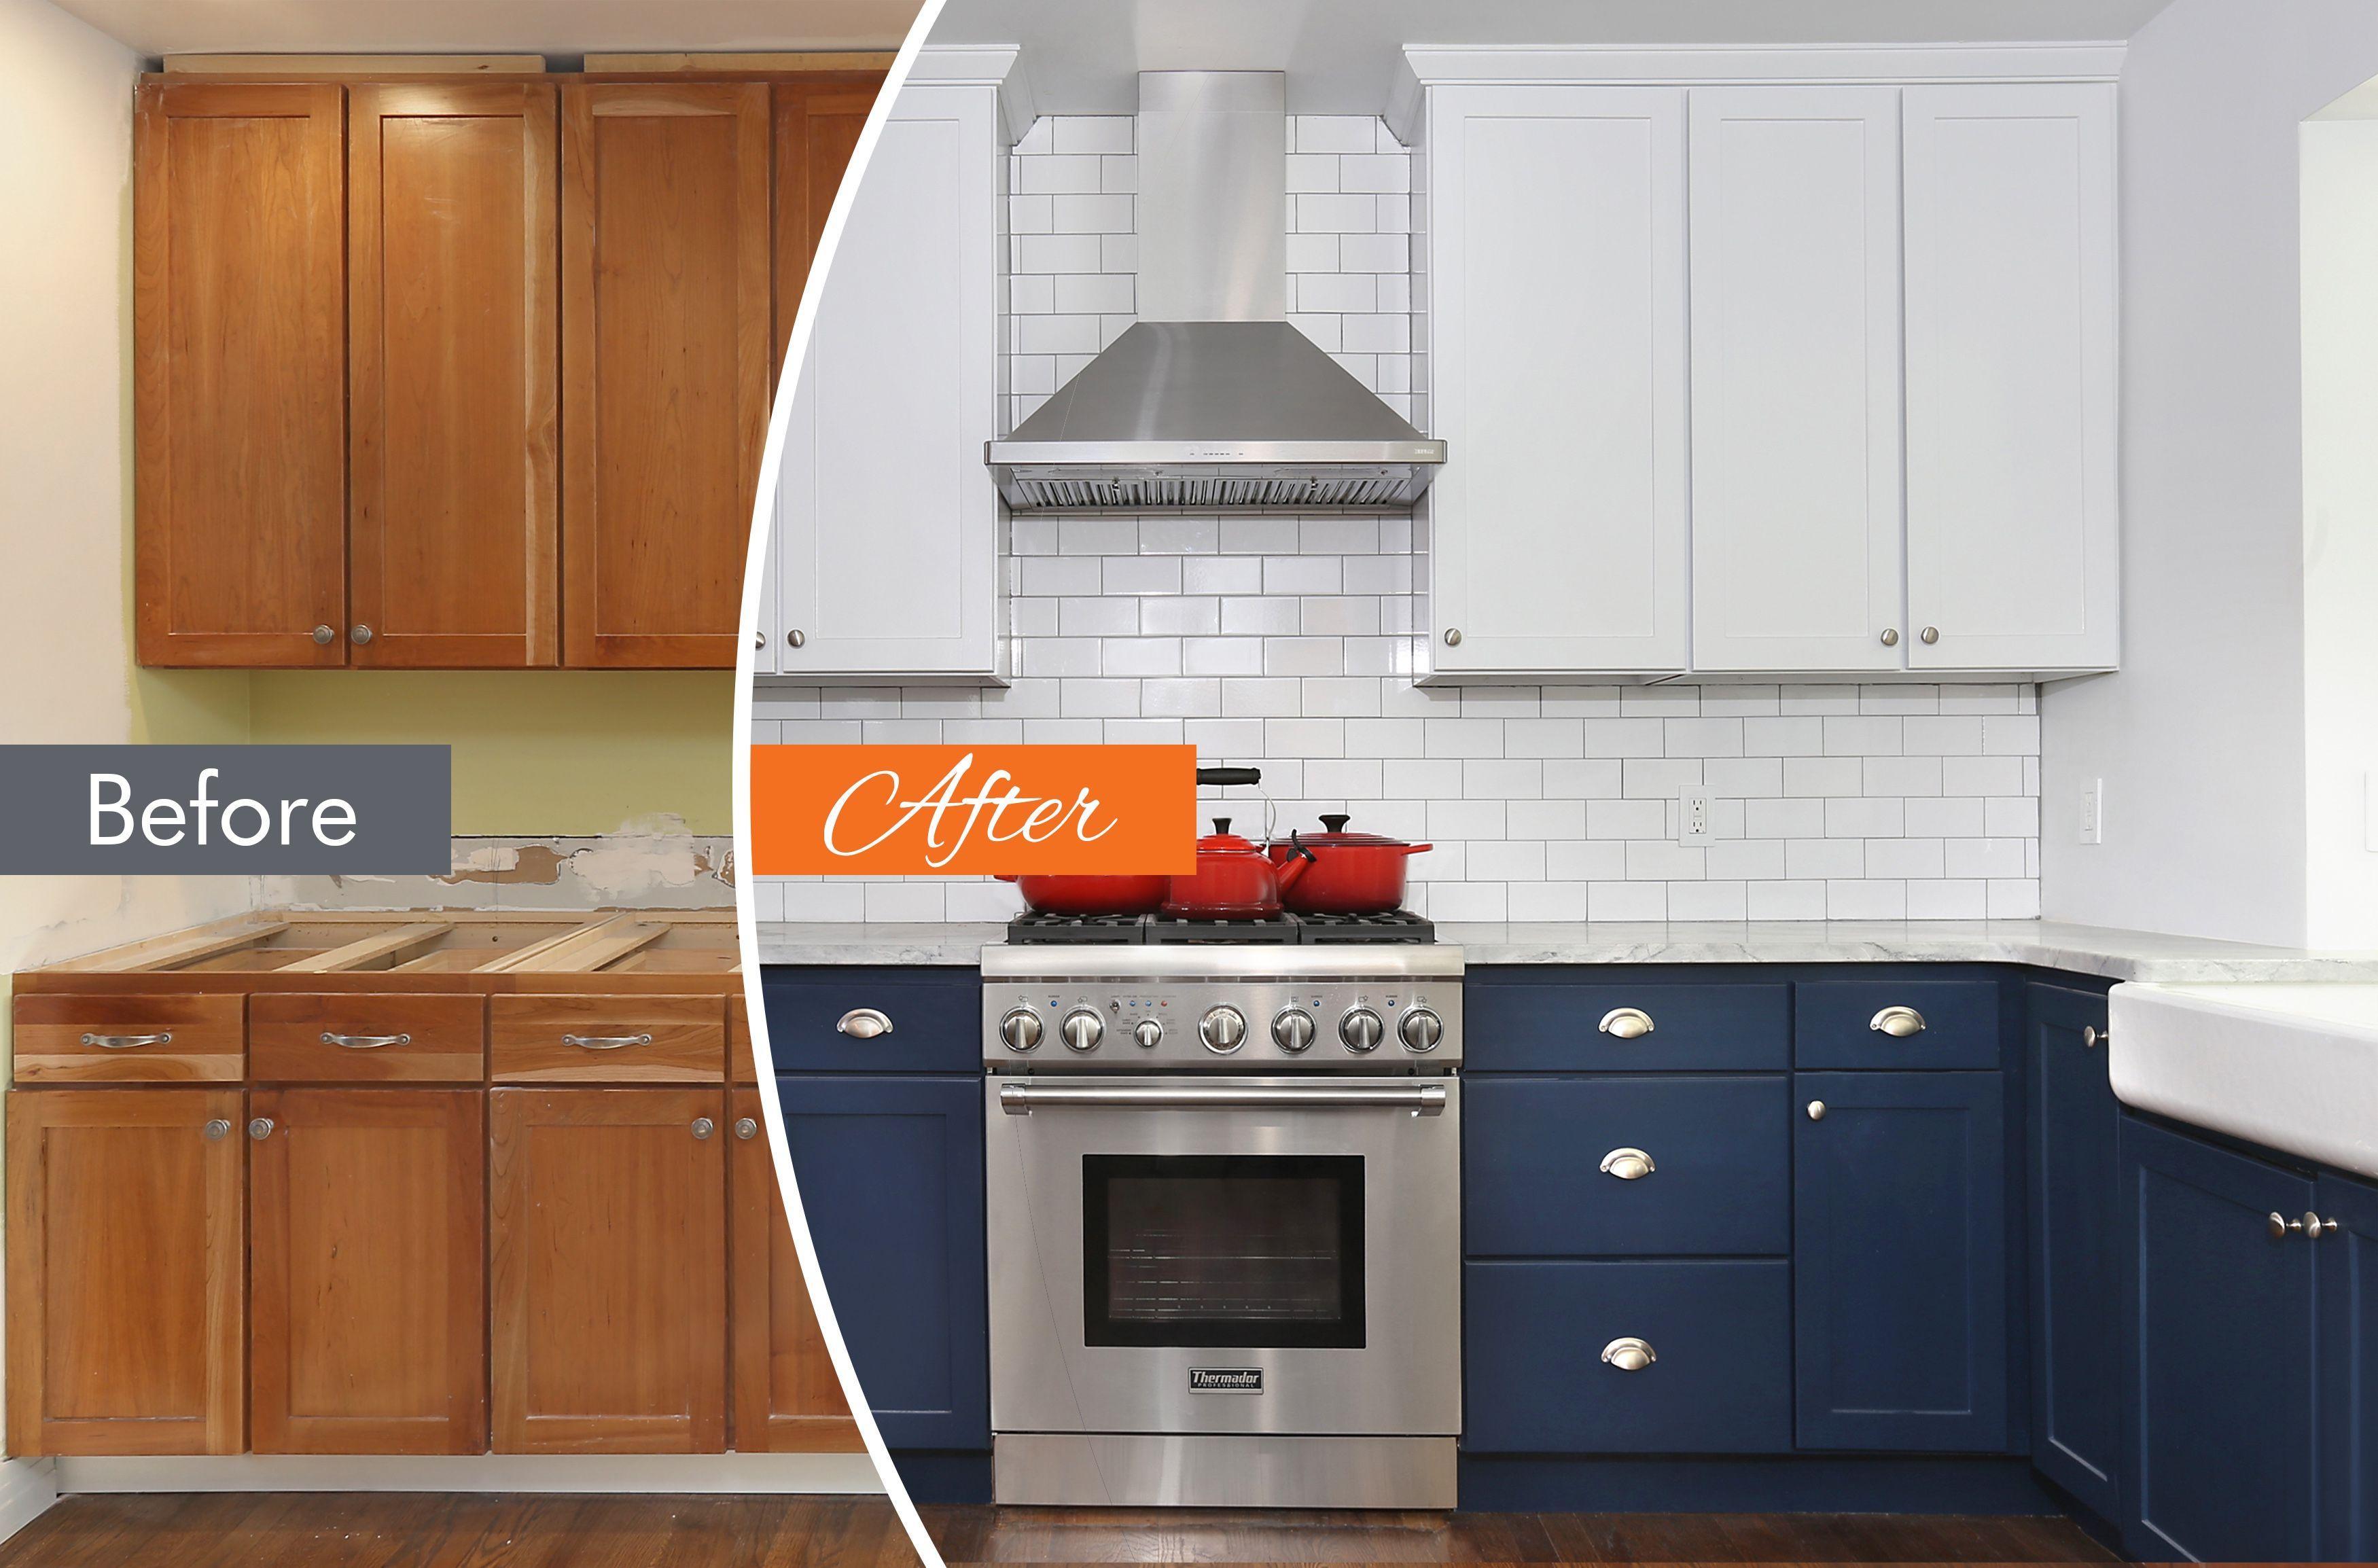 Kitchen Cabinet Refinishing Toms River Nj Kitchen Cabinets Upgrade Kitchen Design Refinish Kitchen Cabinets